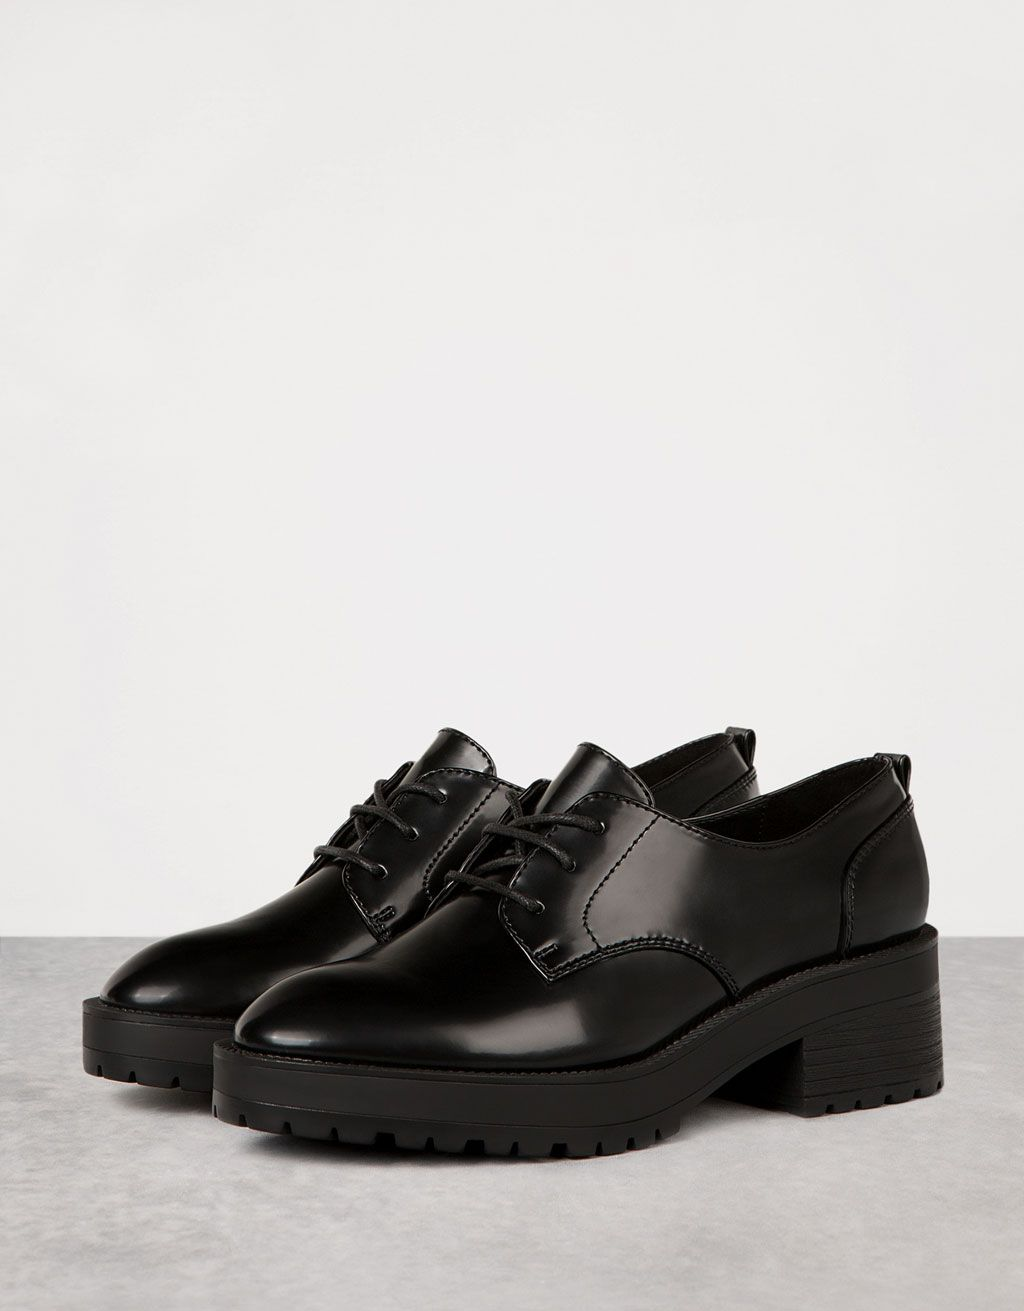 Zapato vestir tacón piso grueso acordonado - REBAJAS hasta -50% - Bershka  España de0cd0cbe4fa